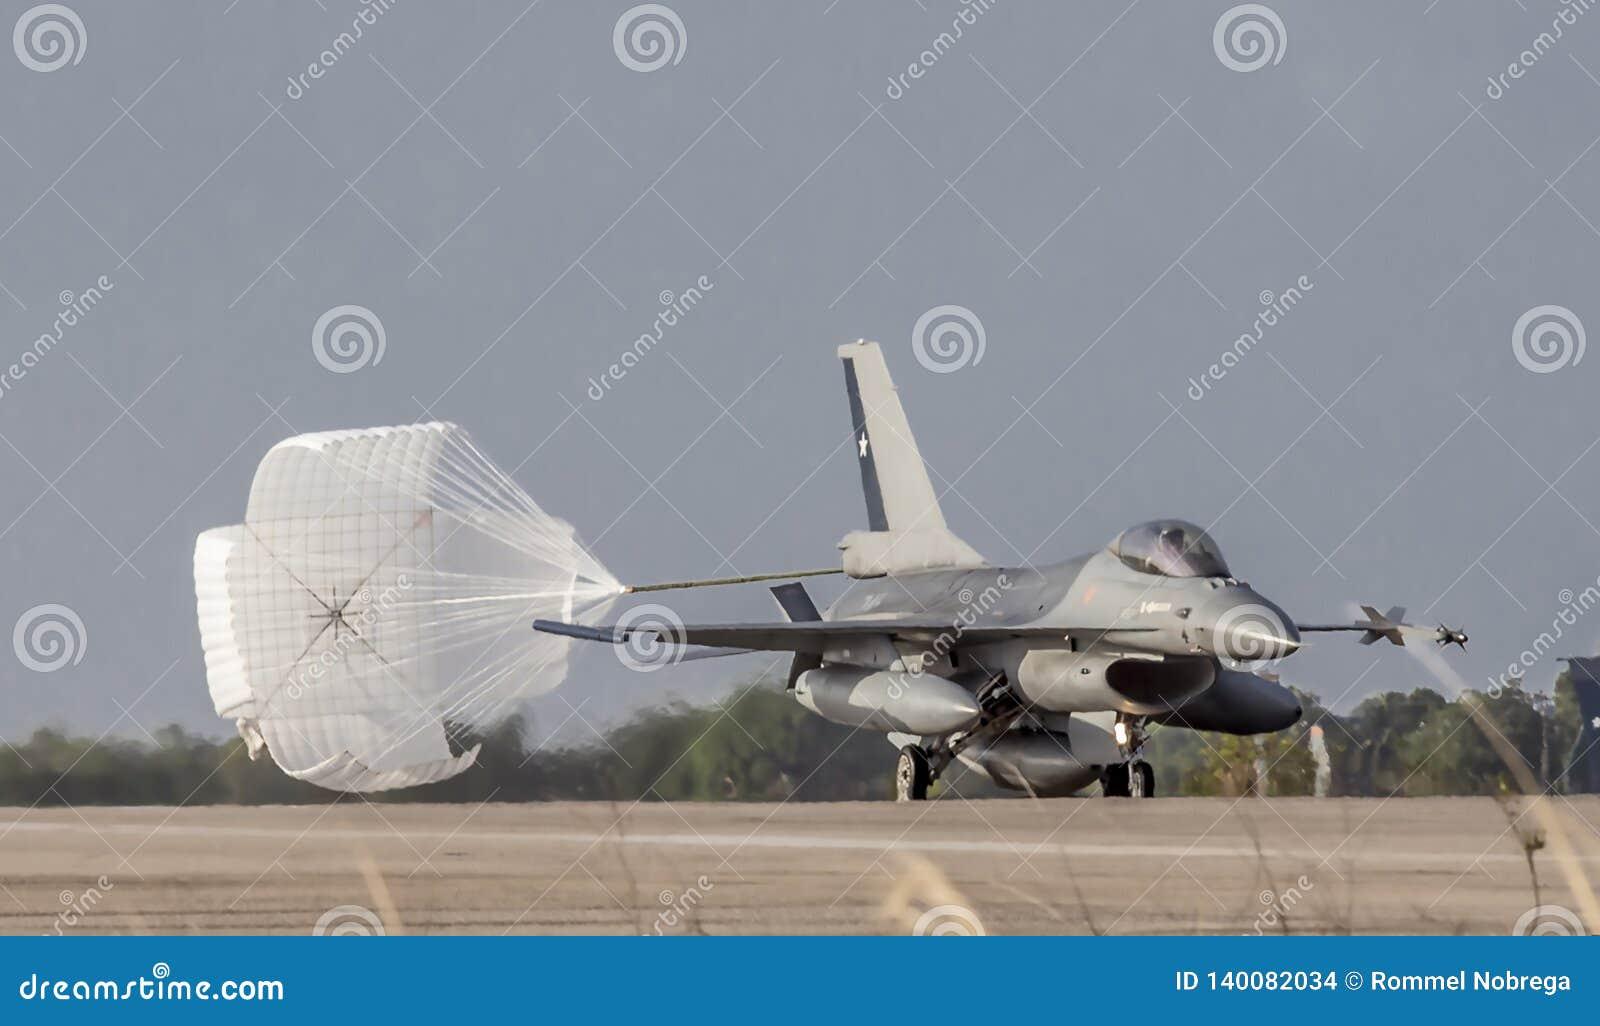 F-16A MLU of the FACH in Operation Cruzex